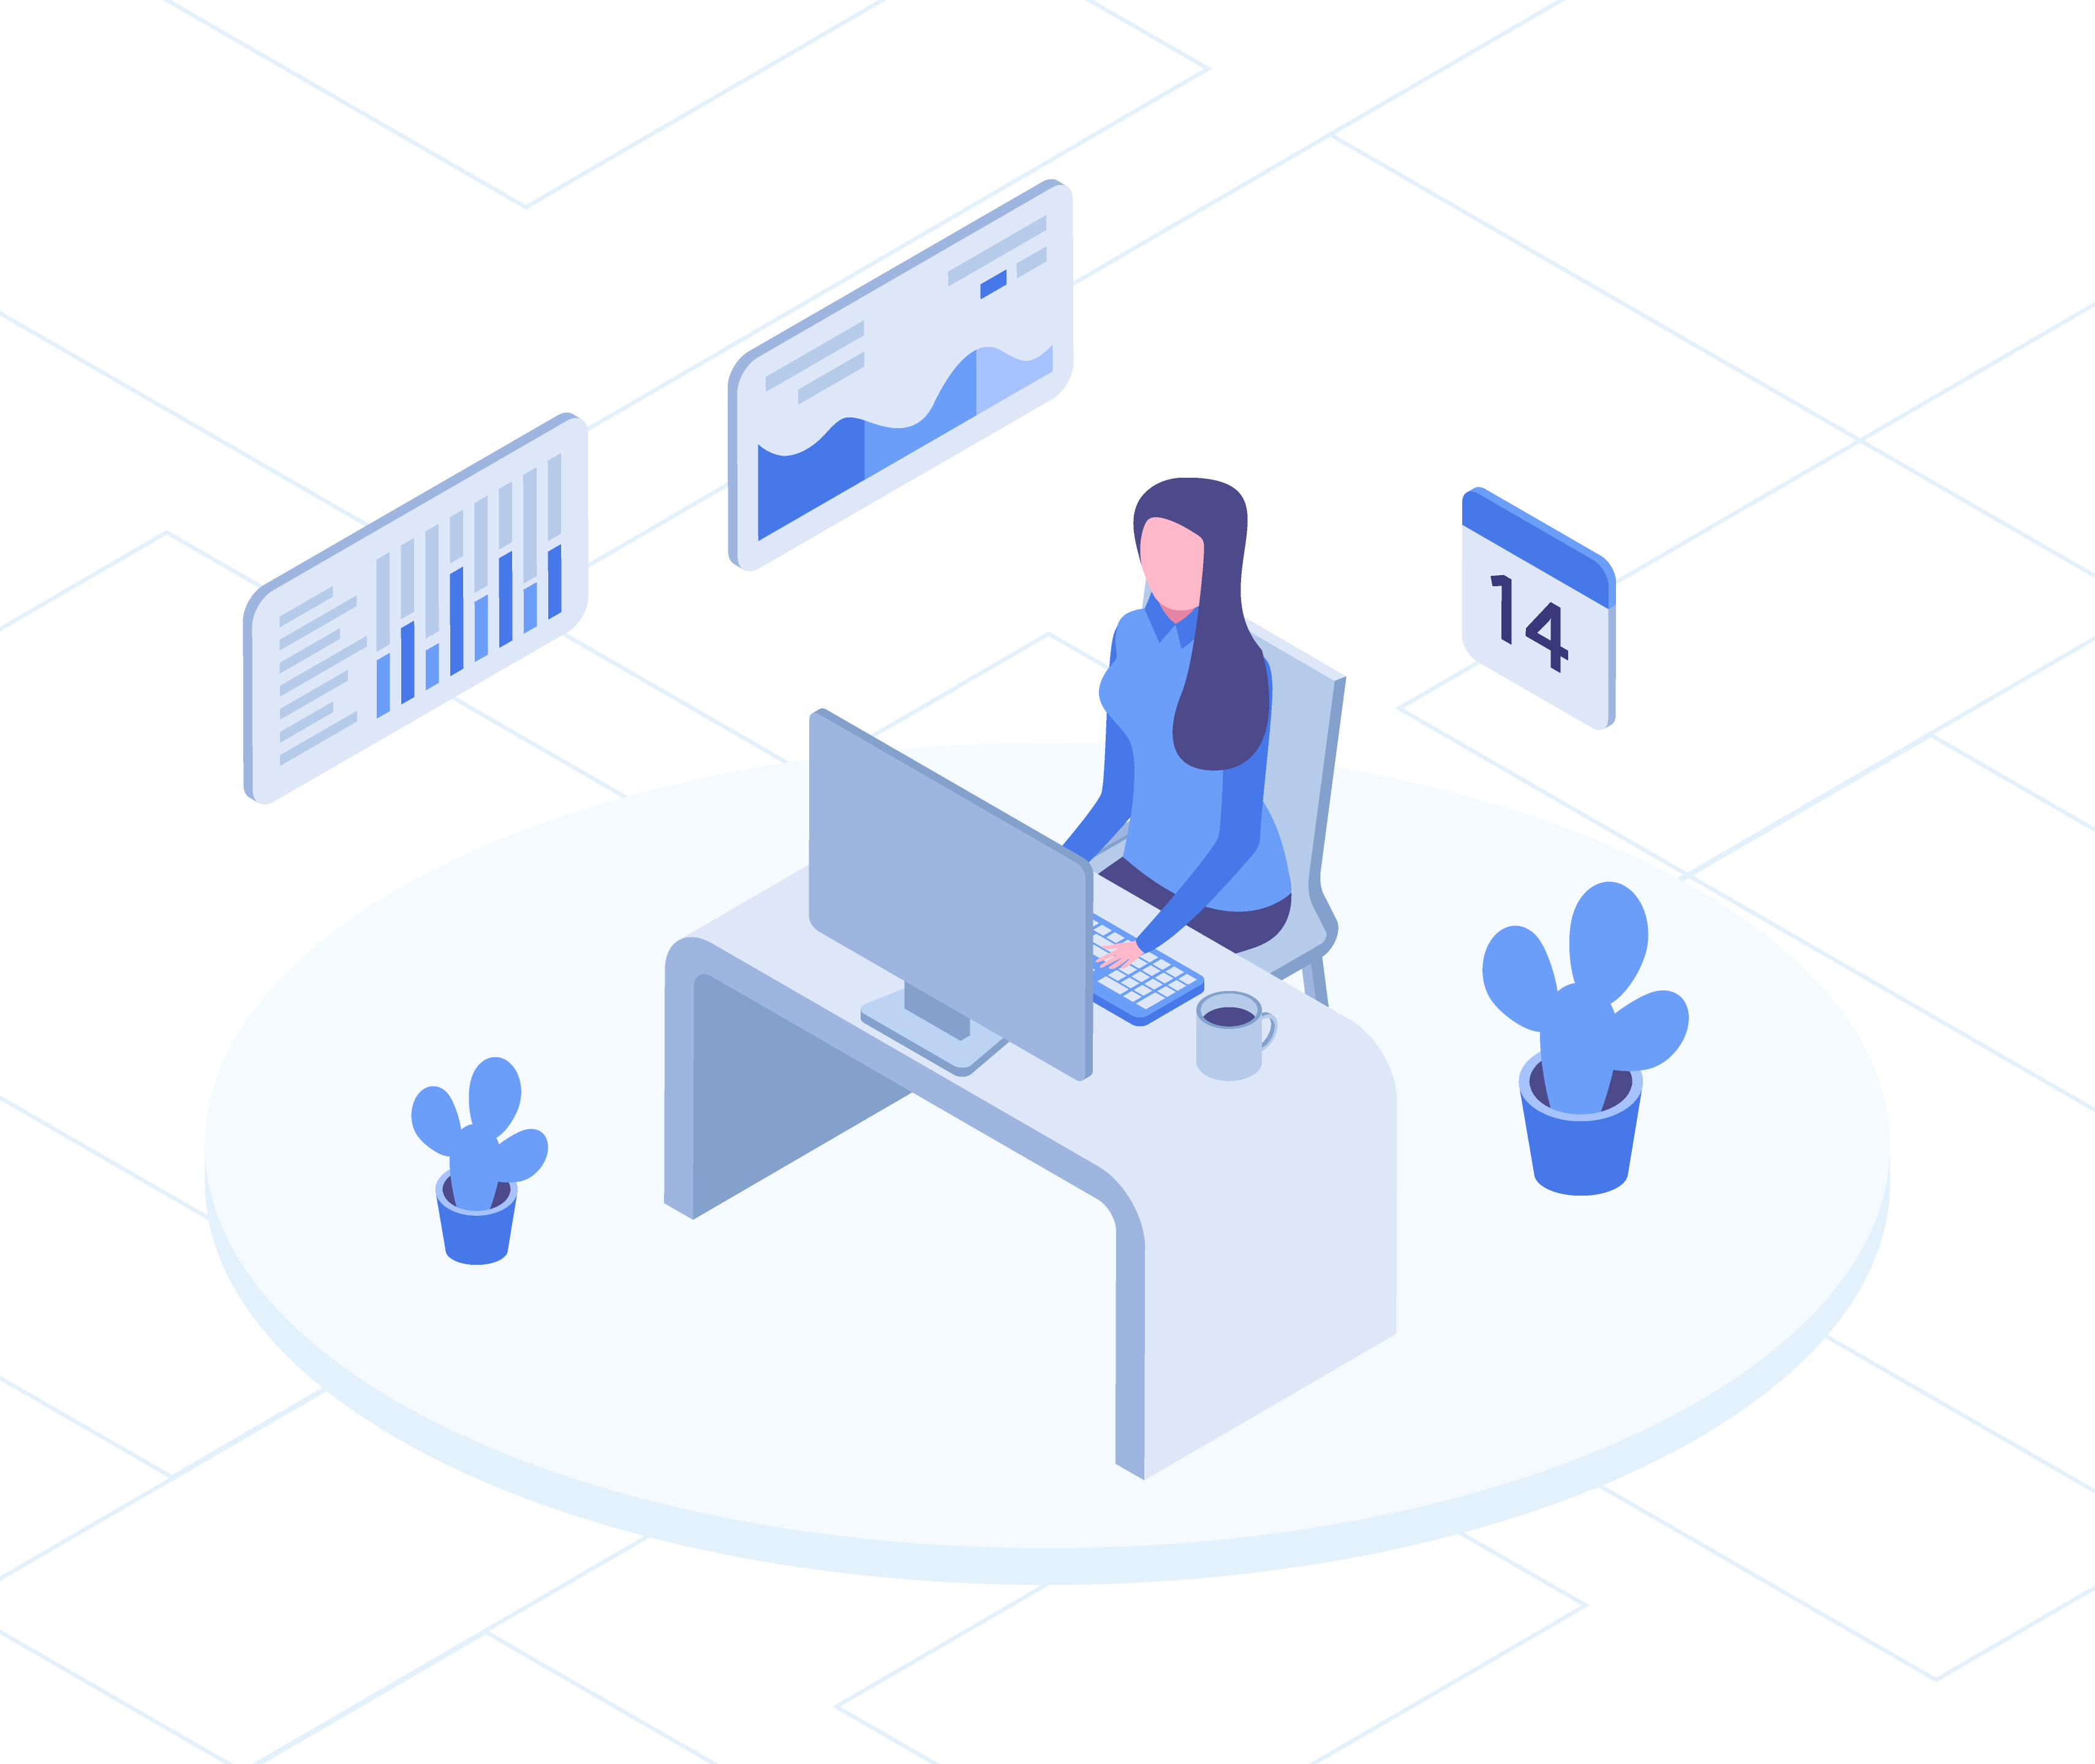 Workplace Isometric Illustration